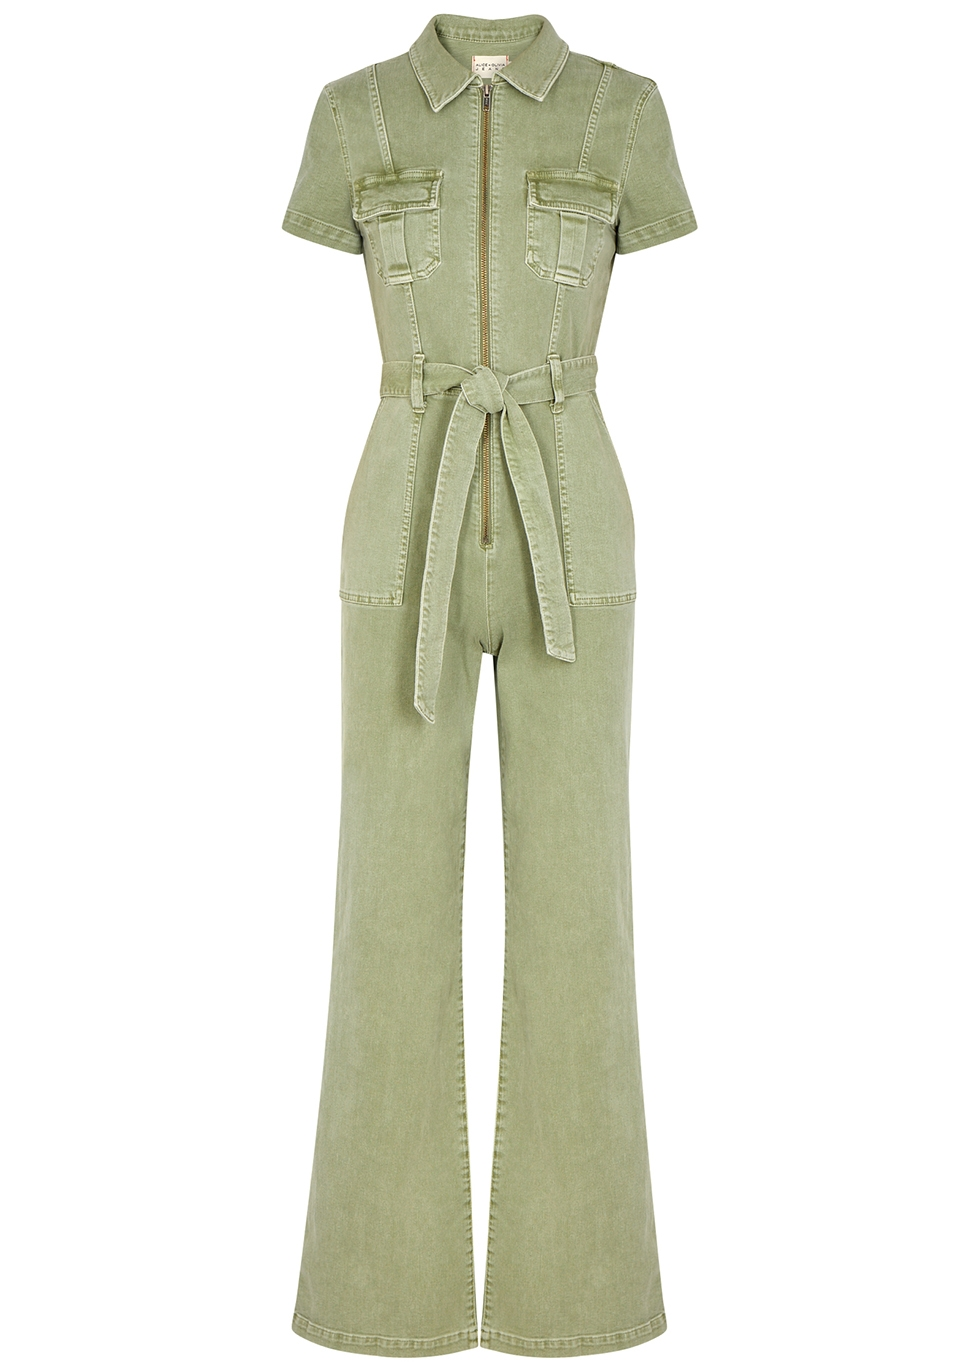 Gorgeous army green stretch-denim jumpsuit